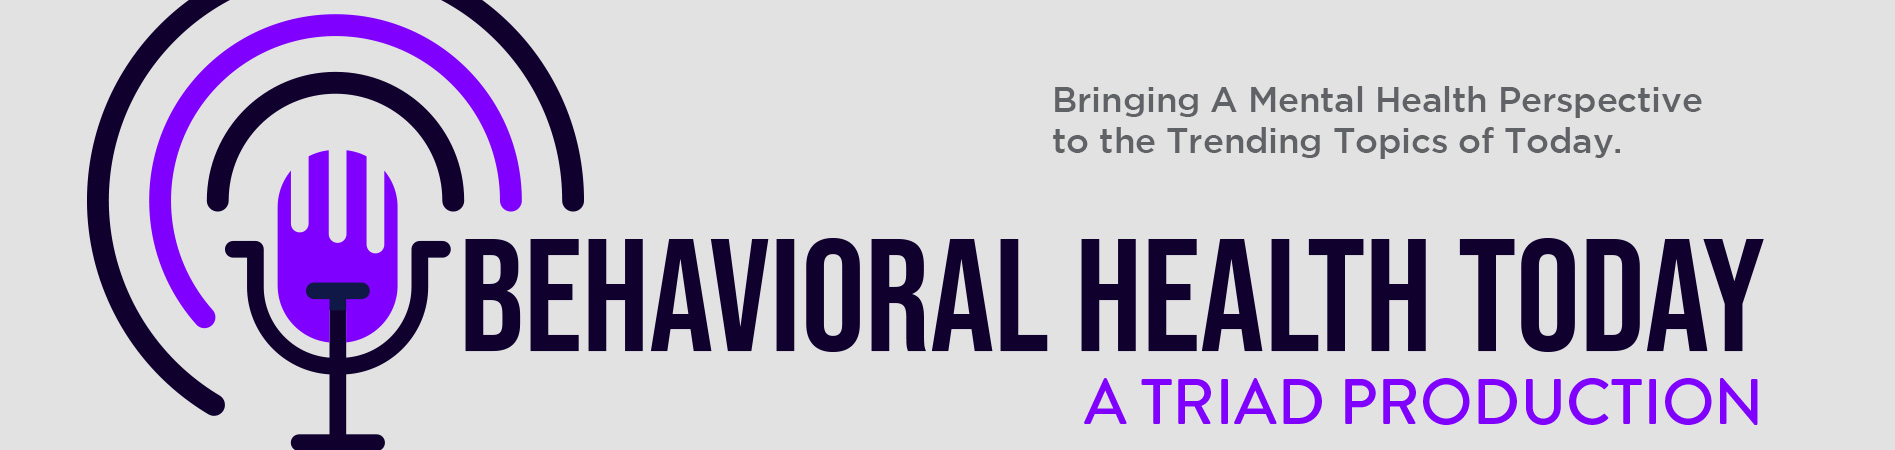 Behavioral Health Today Podcast banner